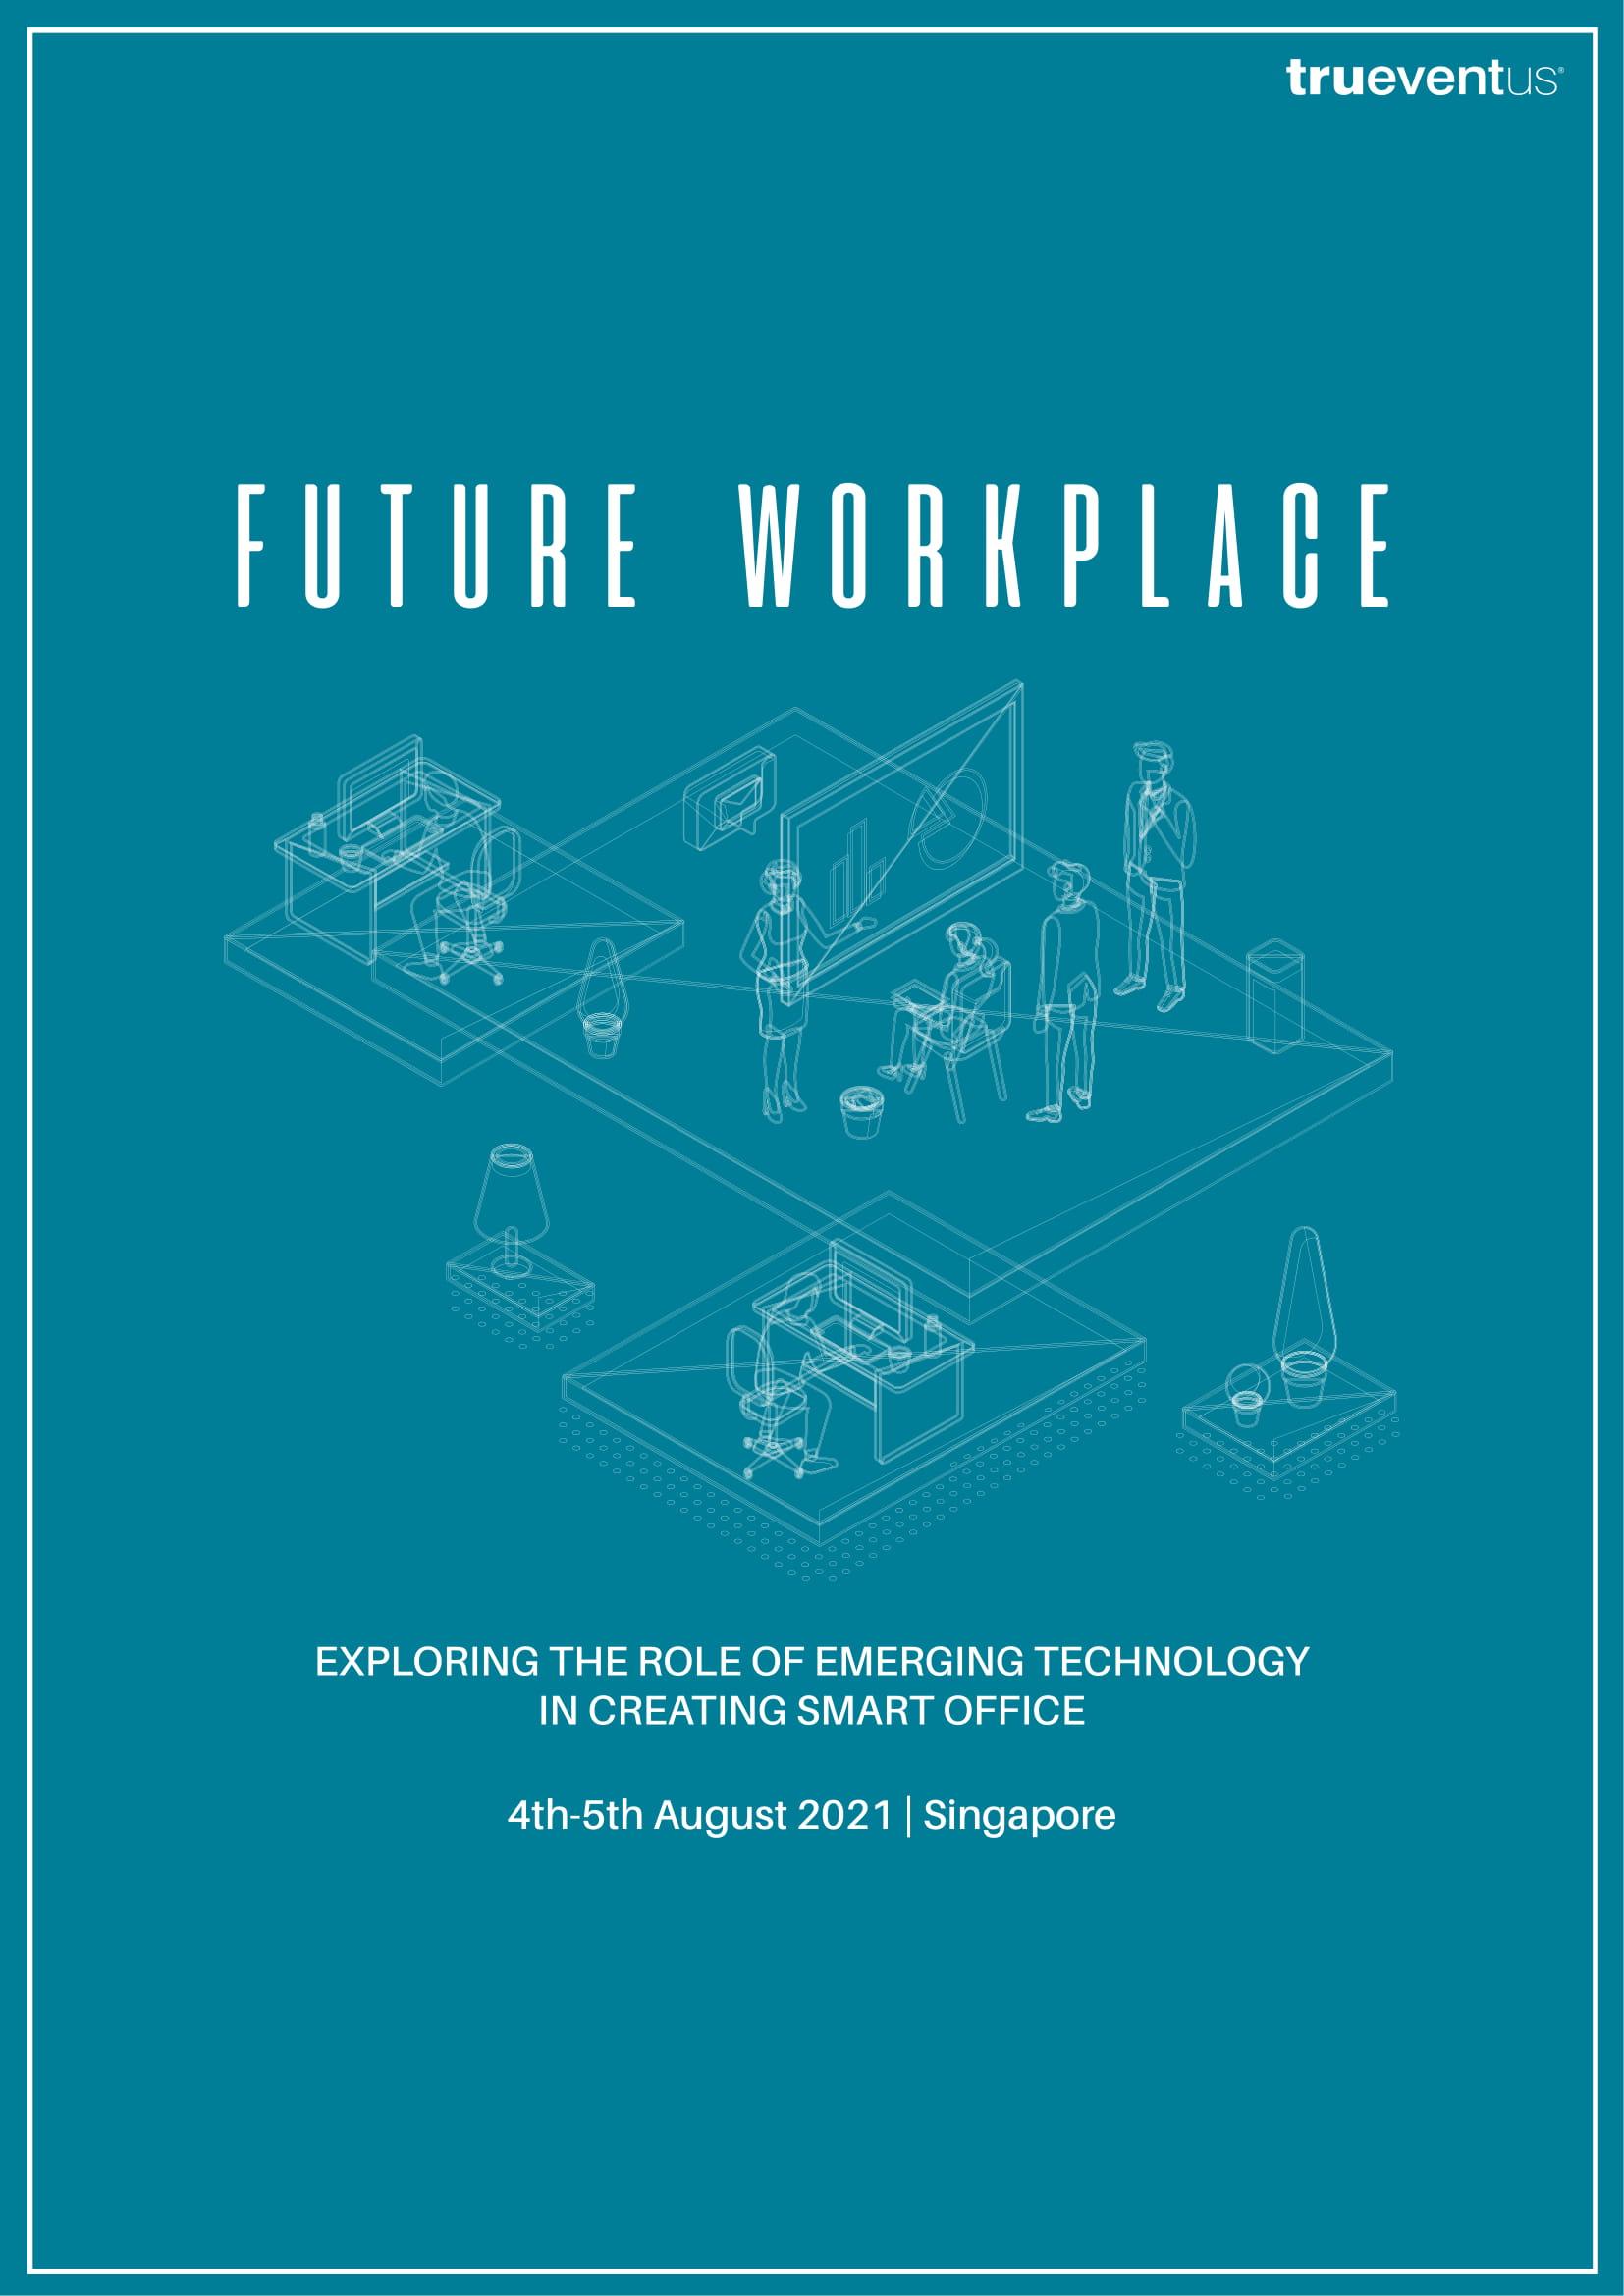 FUTURE WORKPLACE VIRTUAL SUMMIT SG AUGUST 2021